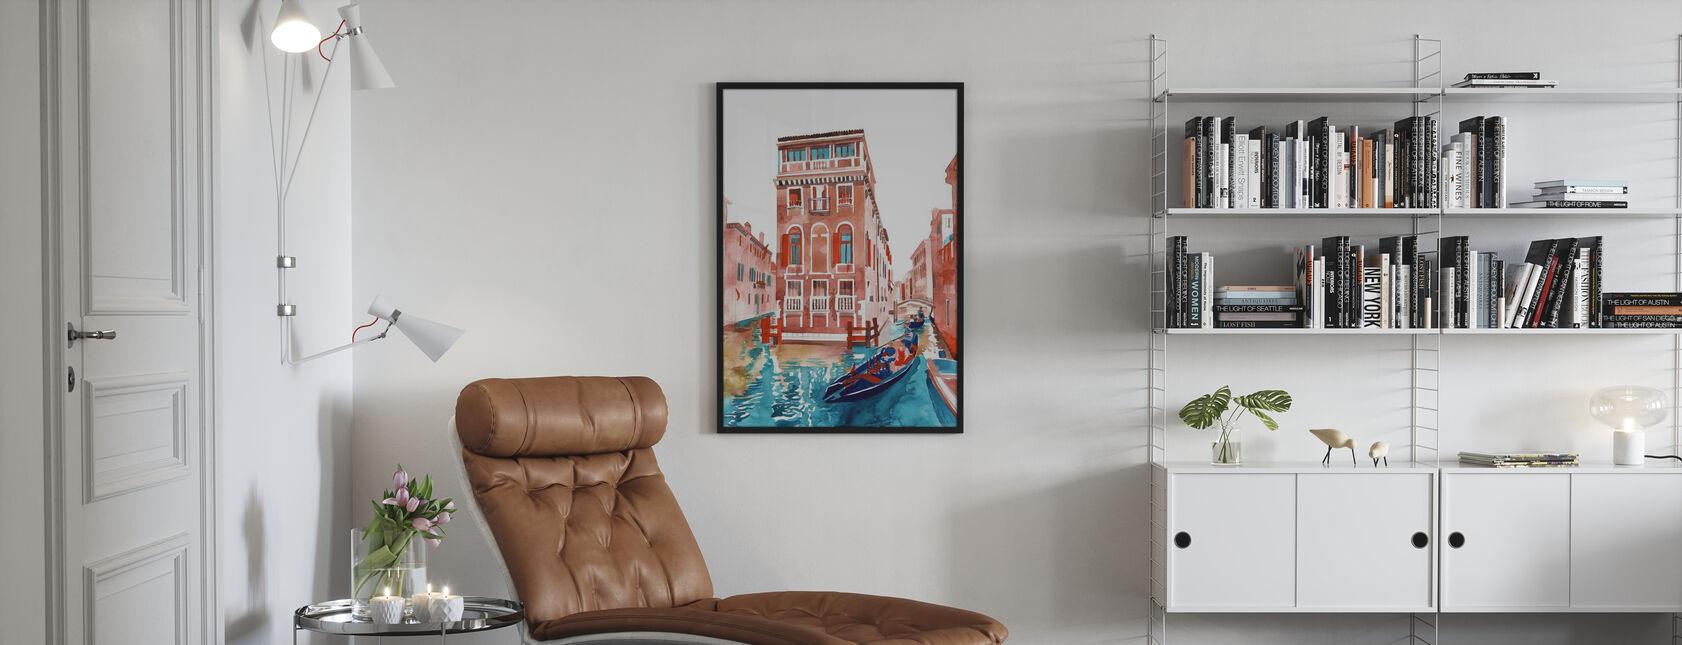 Venice Street - Poster - Living Room